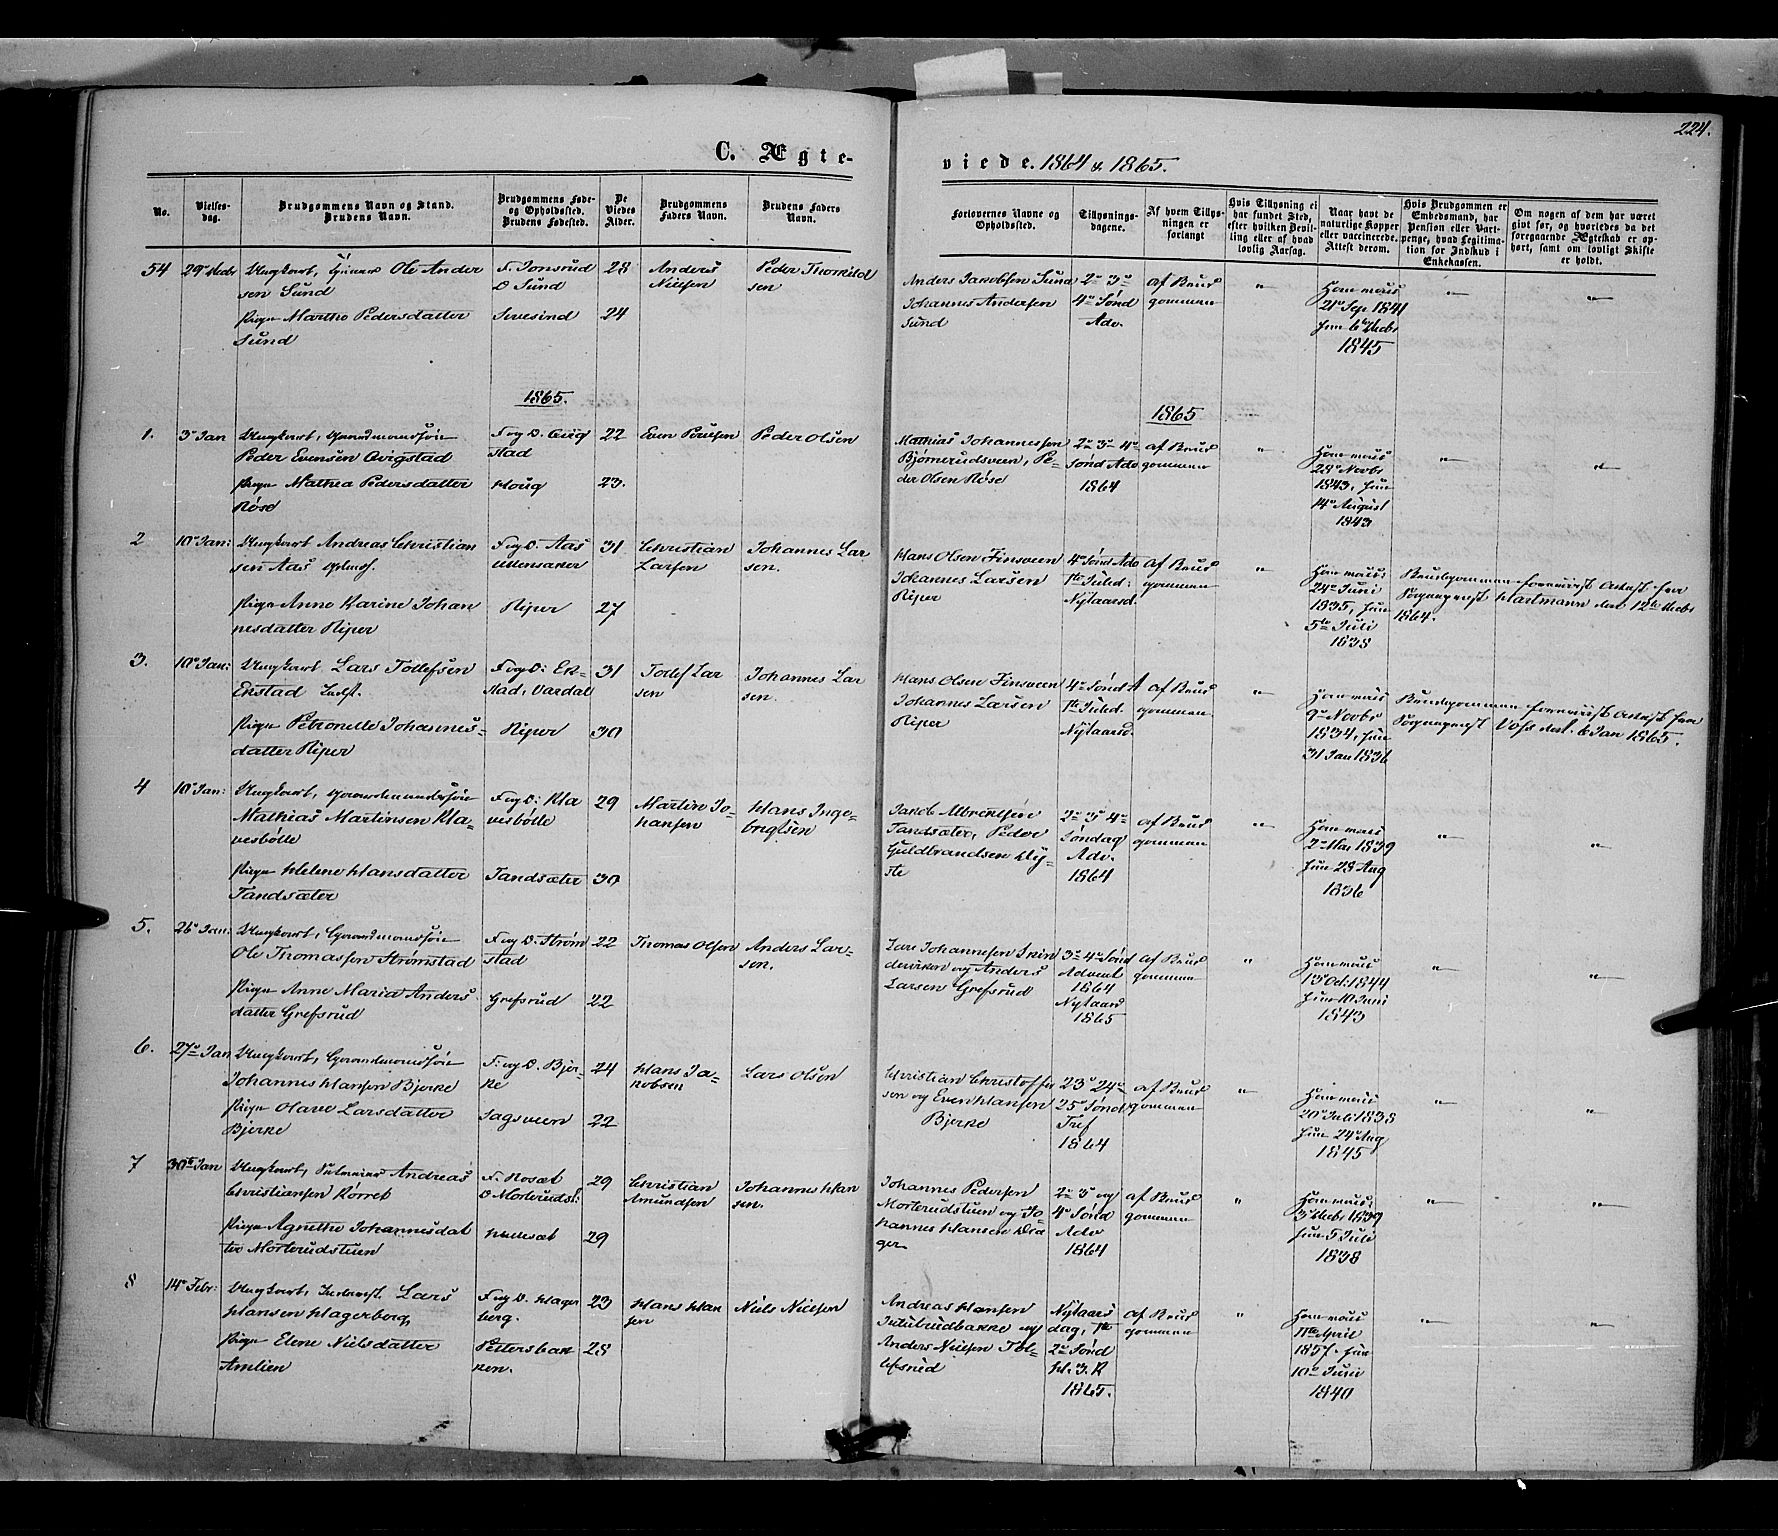 SAH, Vestre Toten prestekontor, H/Ha/Haa/L0007: Ministerialbok nr. 7, 1862-1869, s. 224